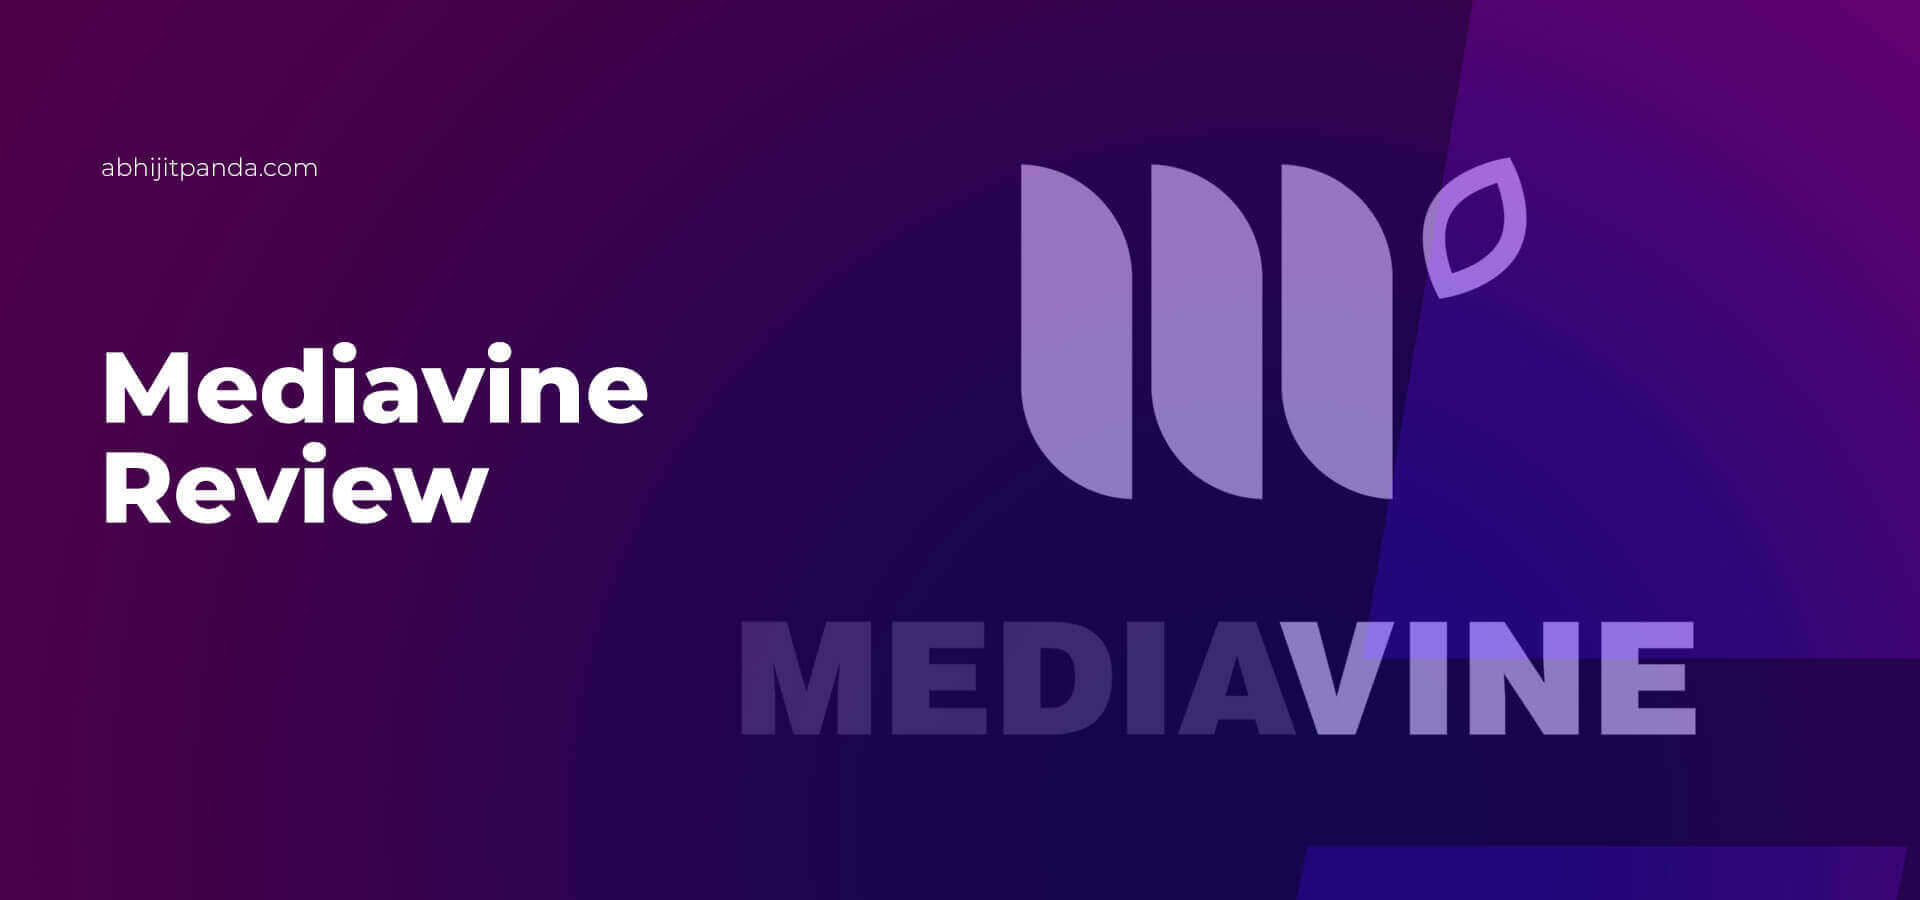 Mediavine Review